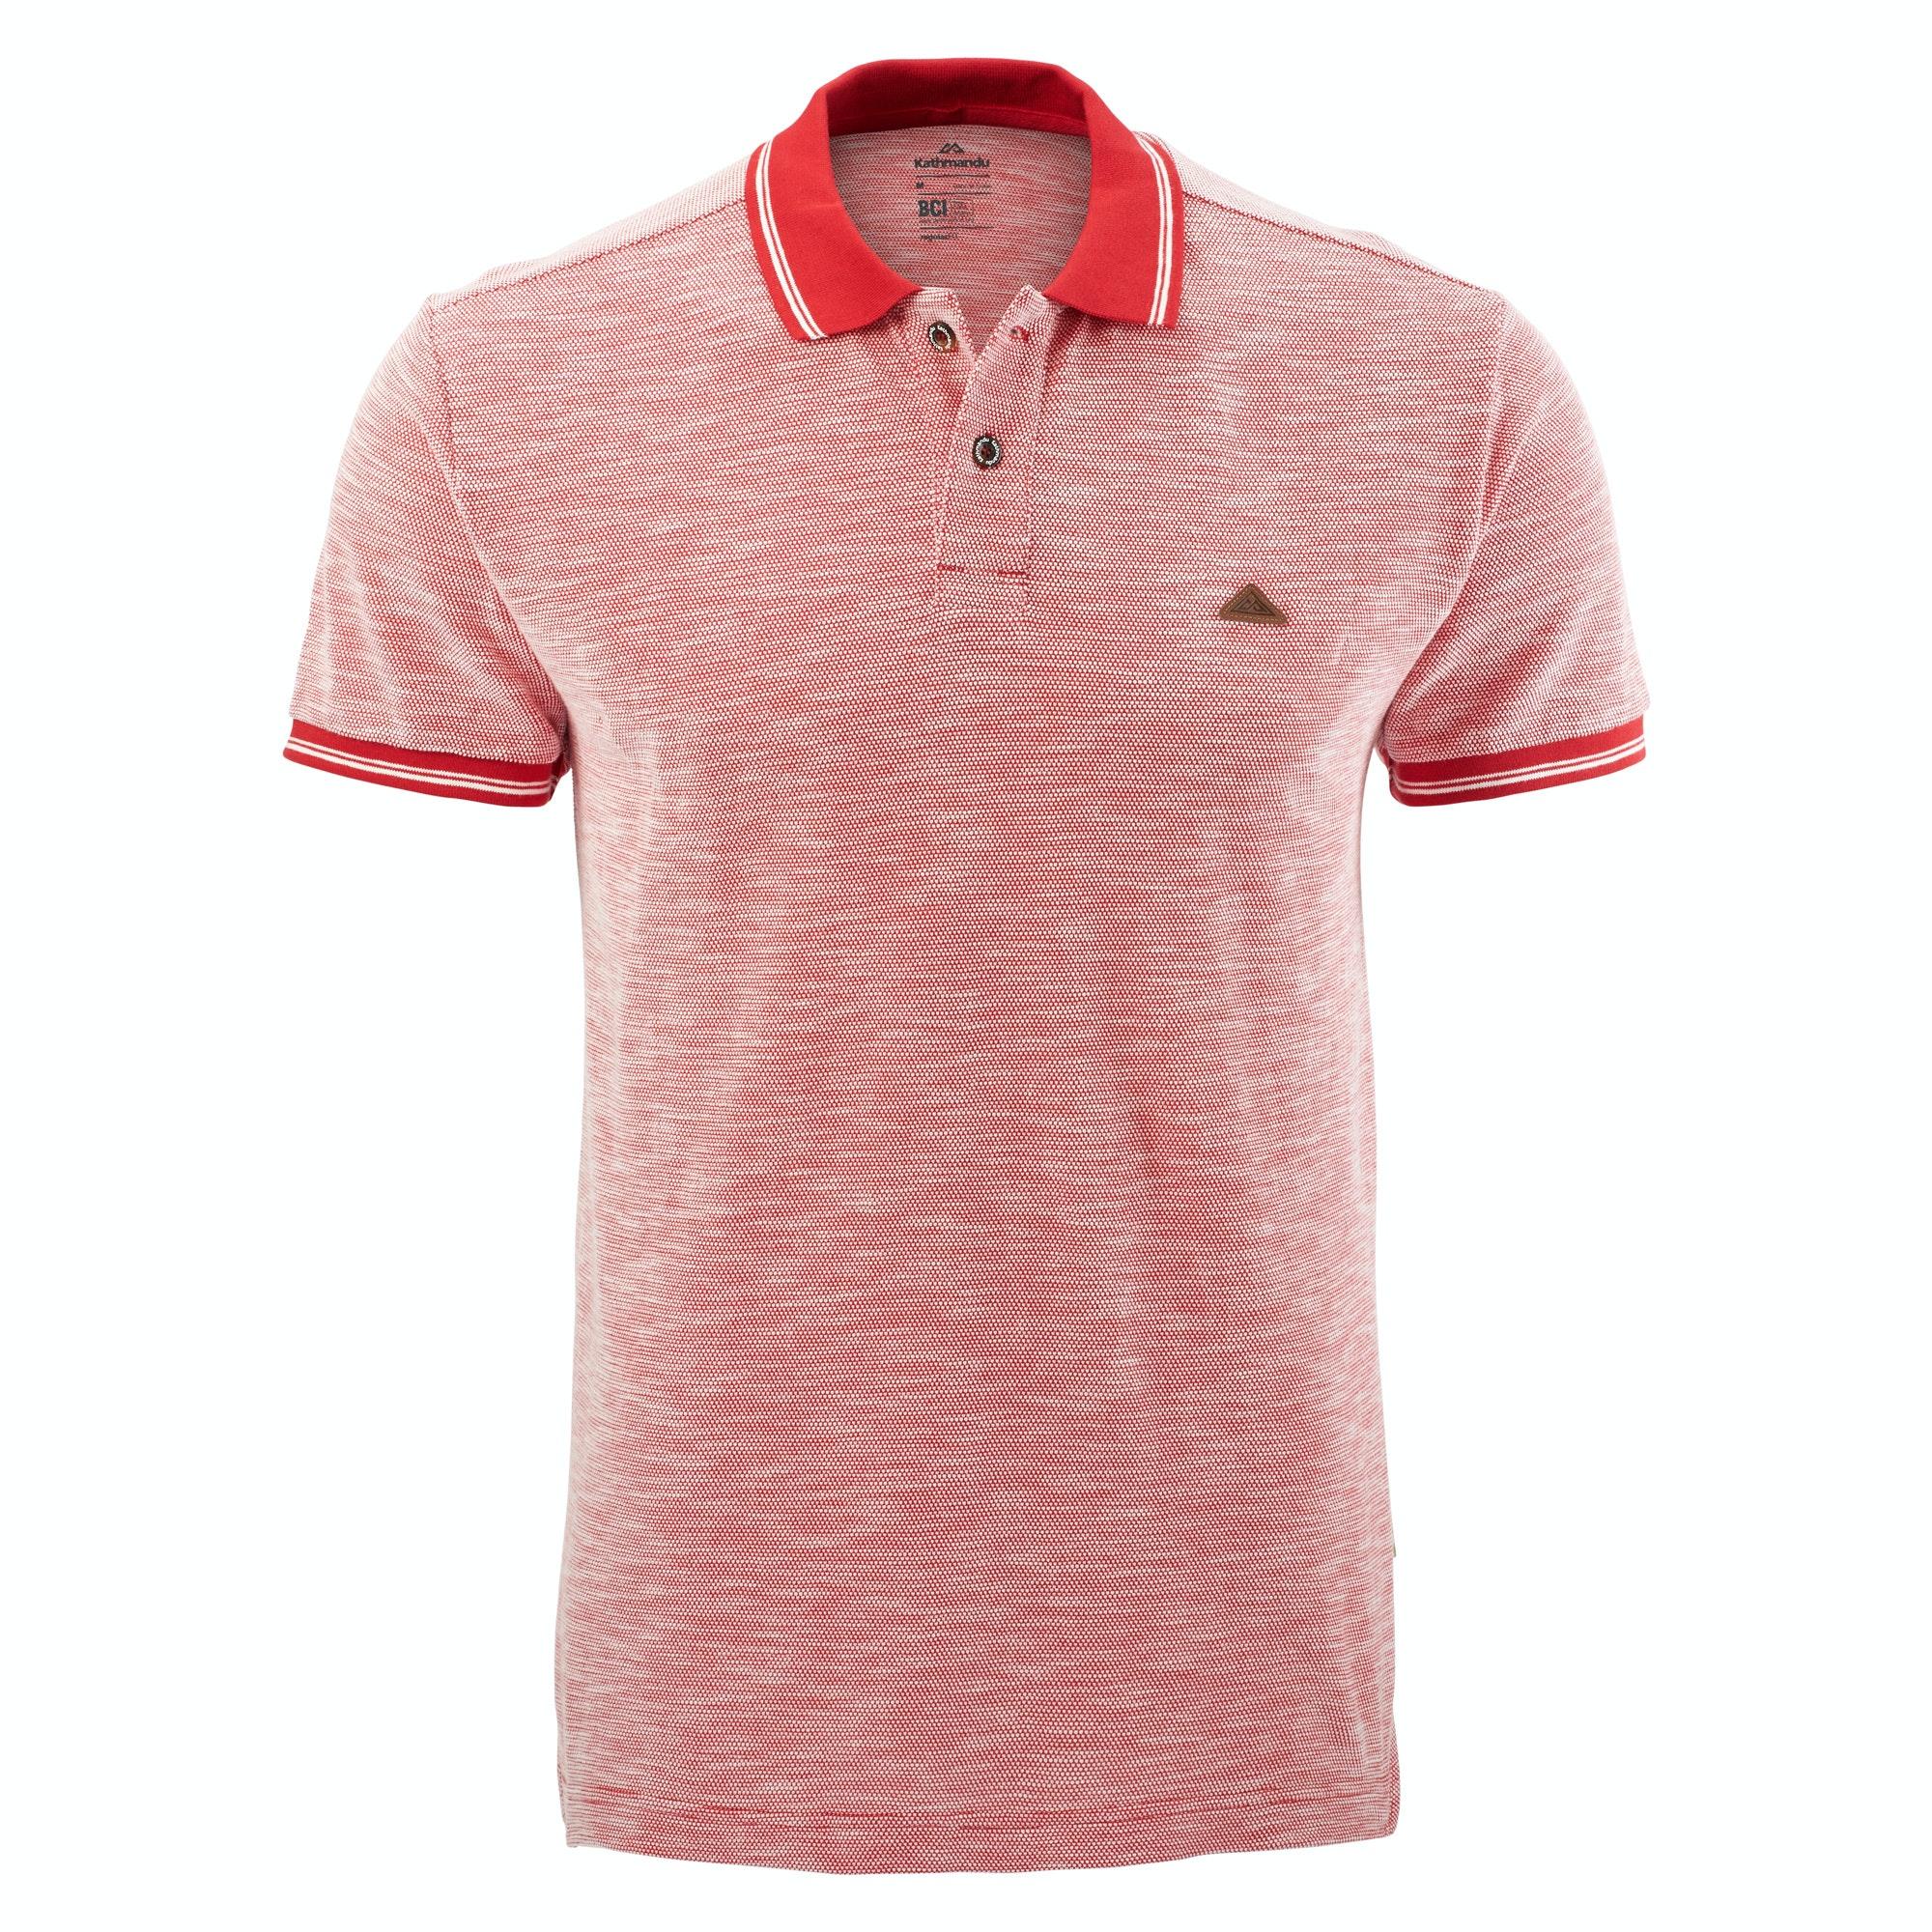 View more of the Batu Men's Polo Shirt